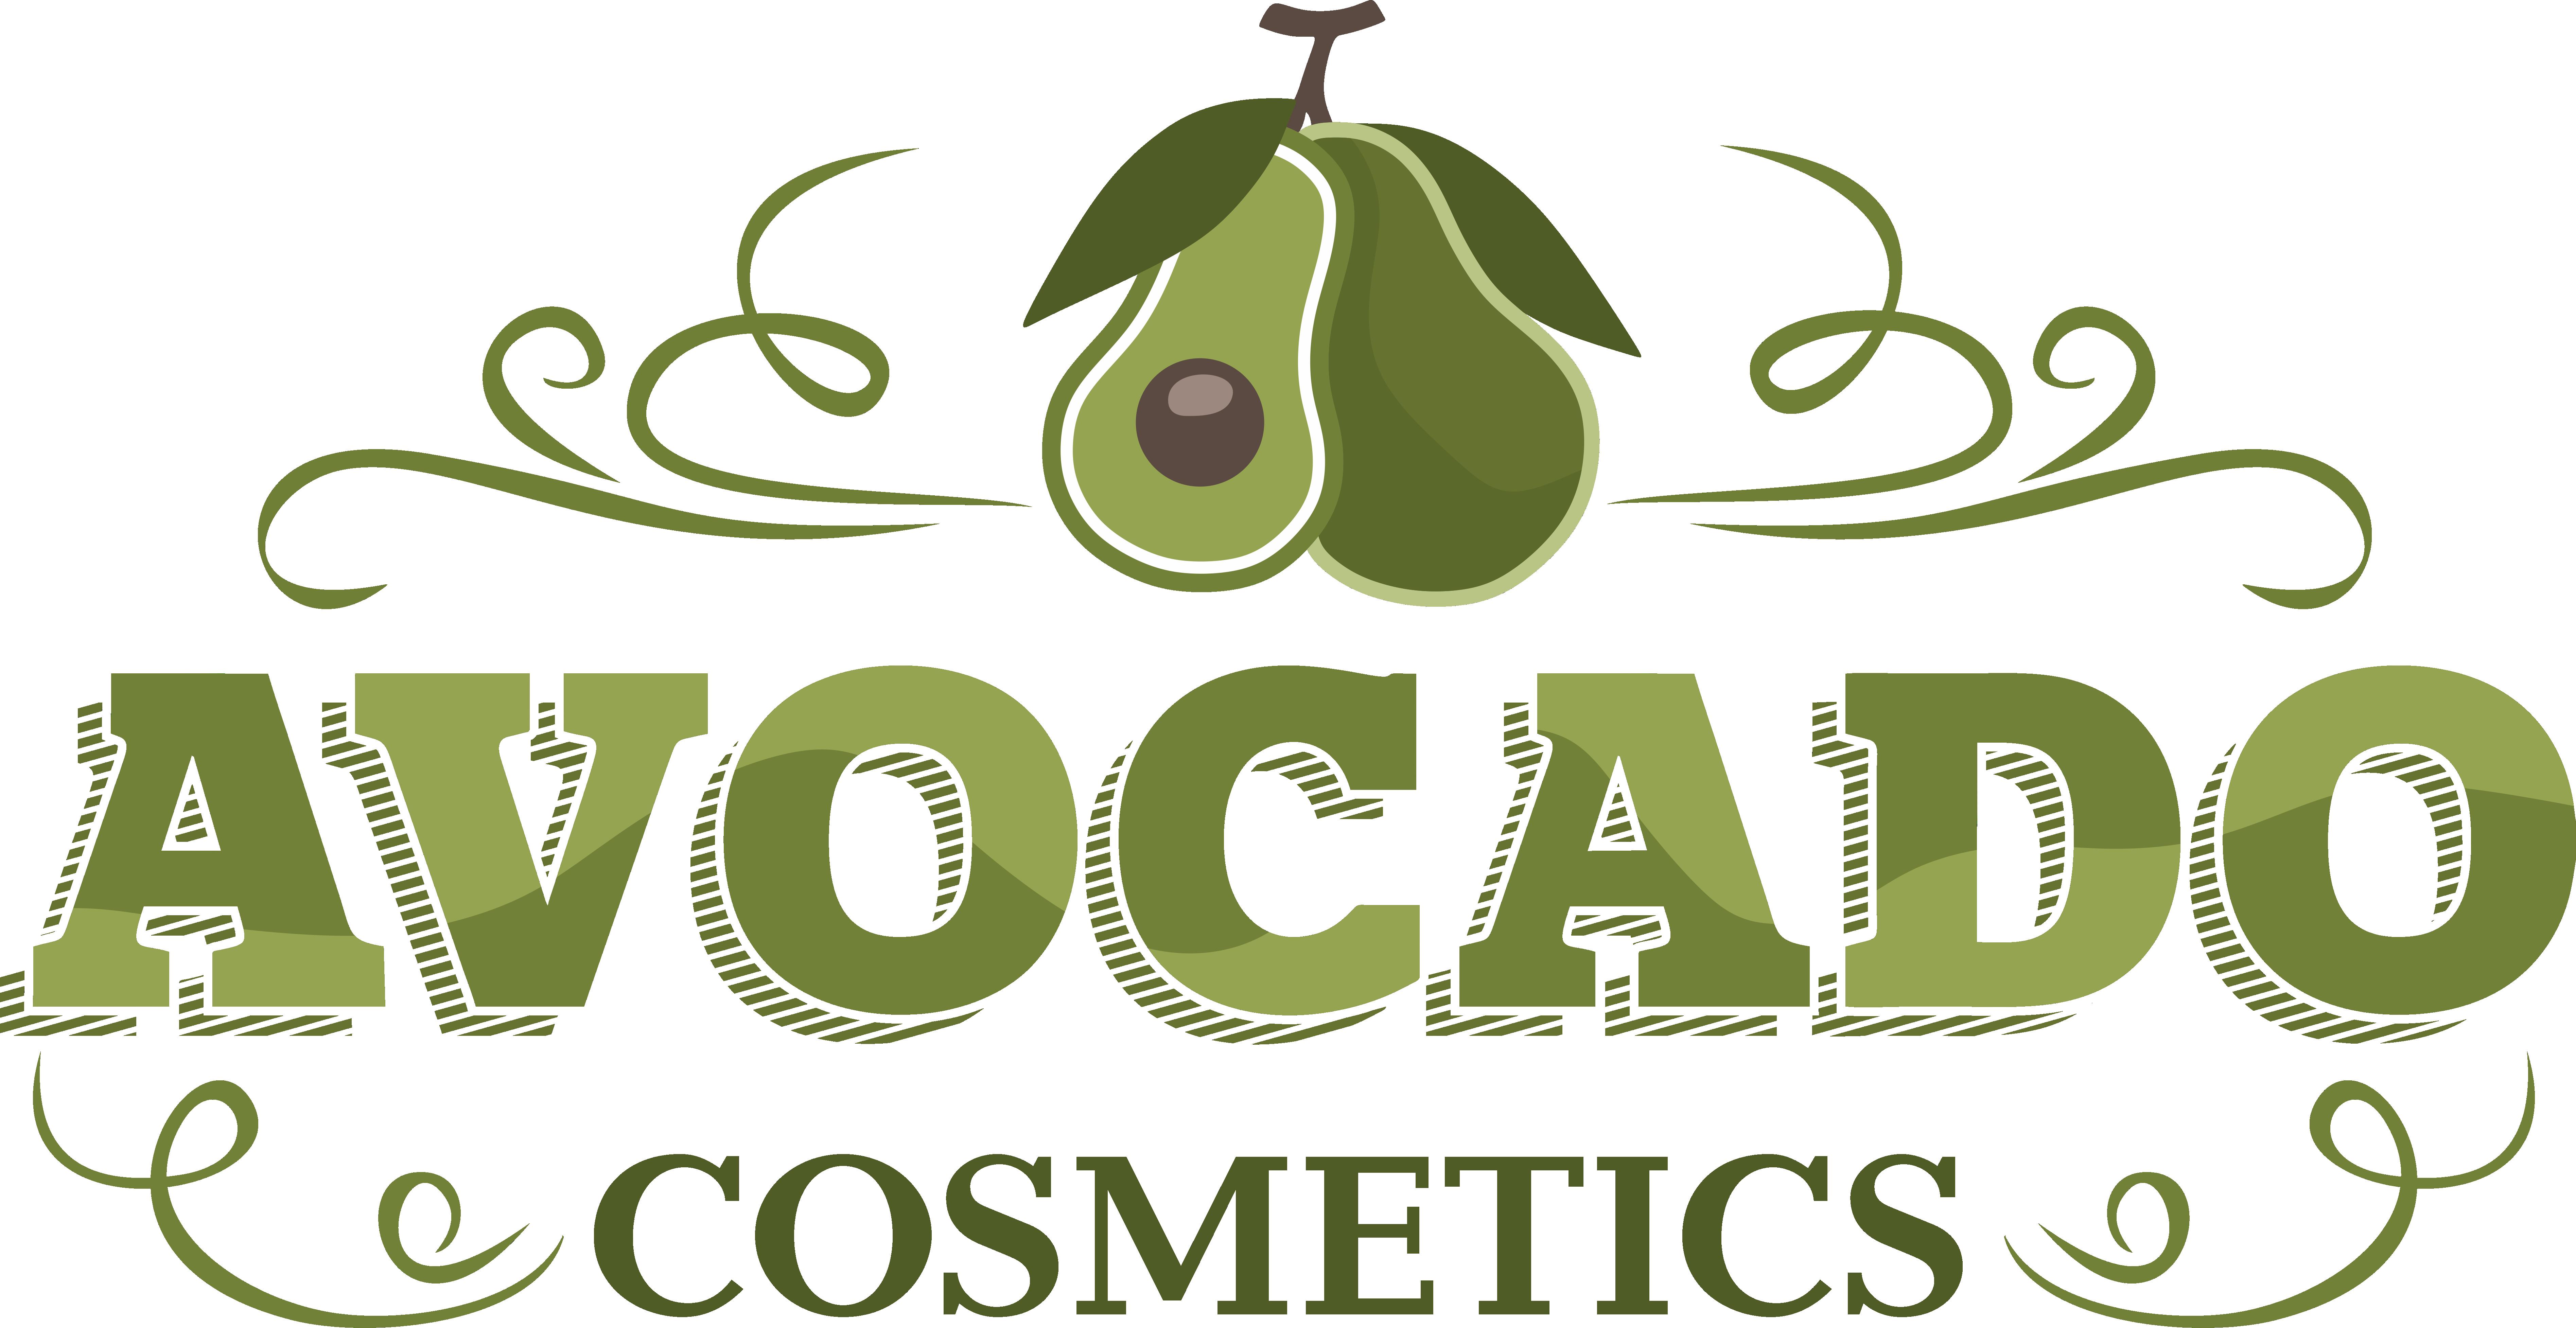 AVOCADO Cosmetics